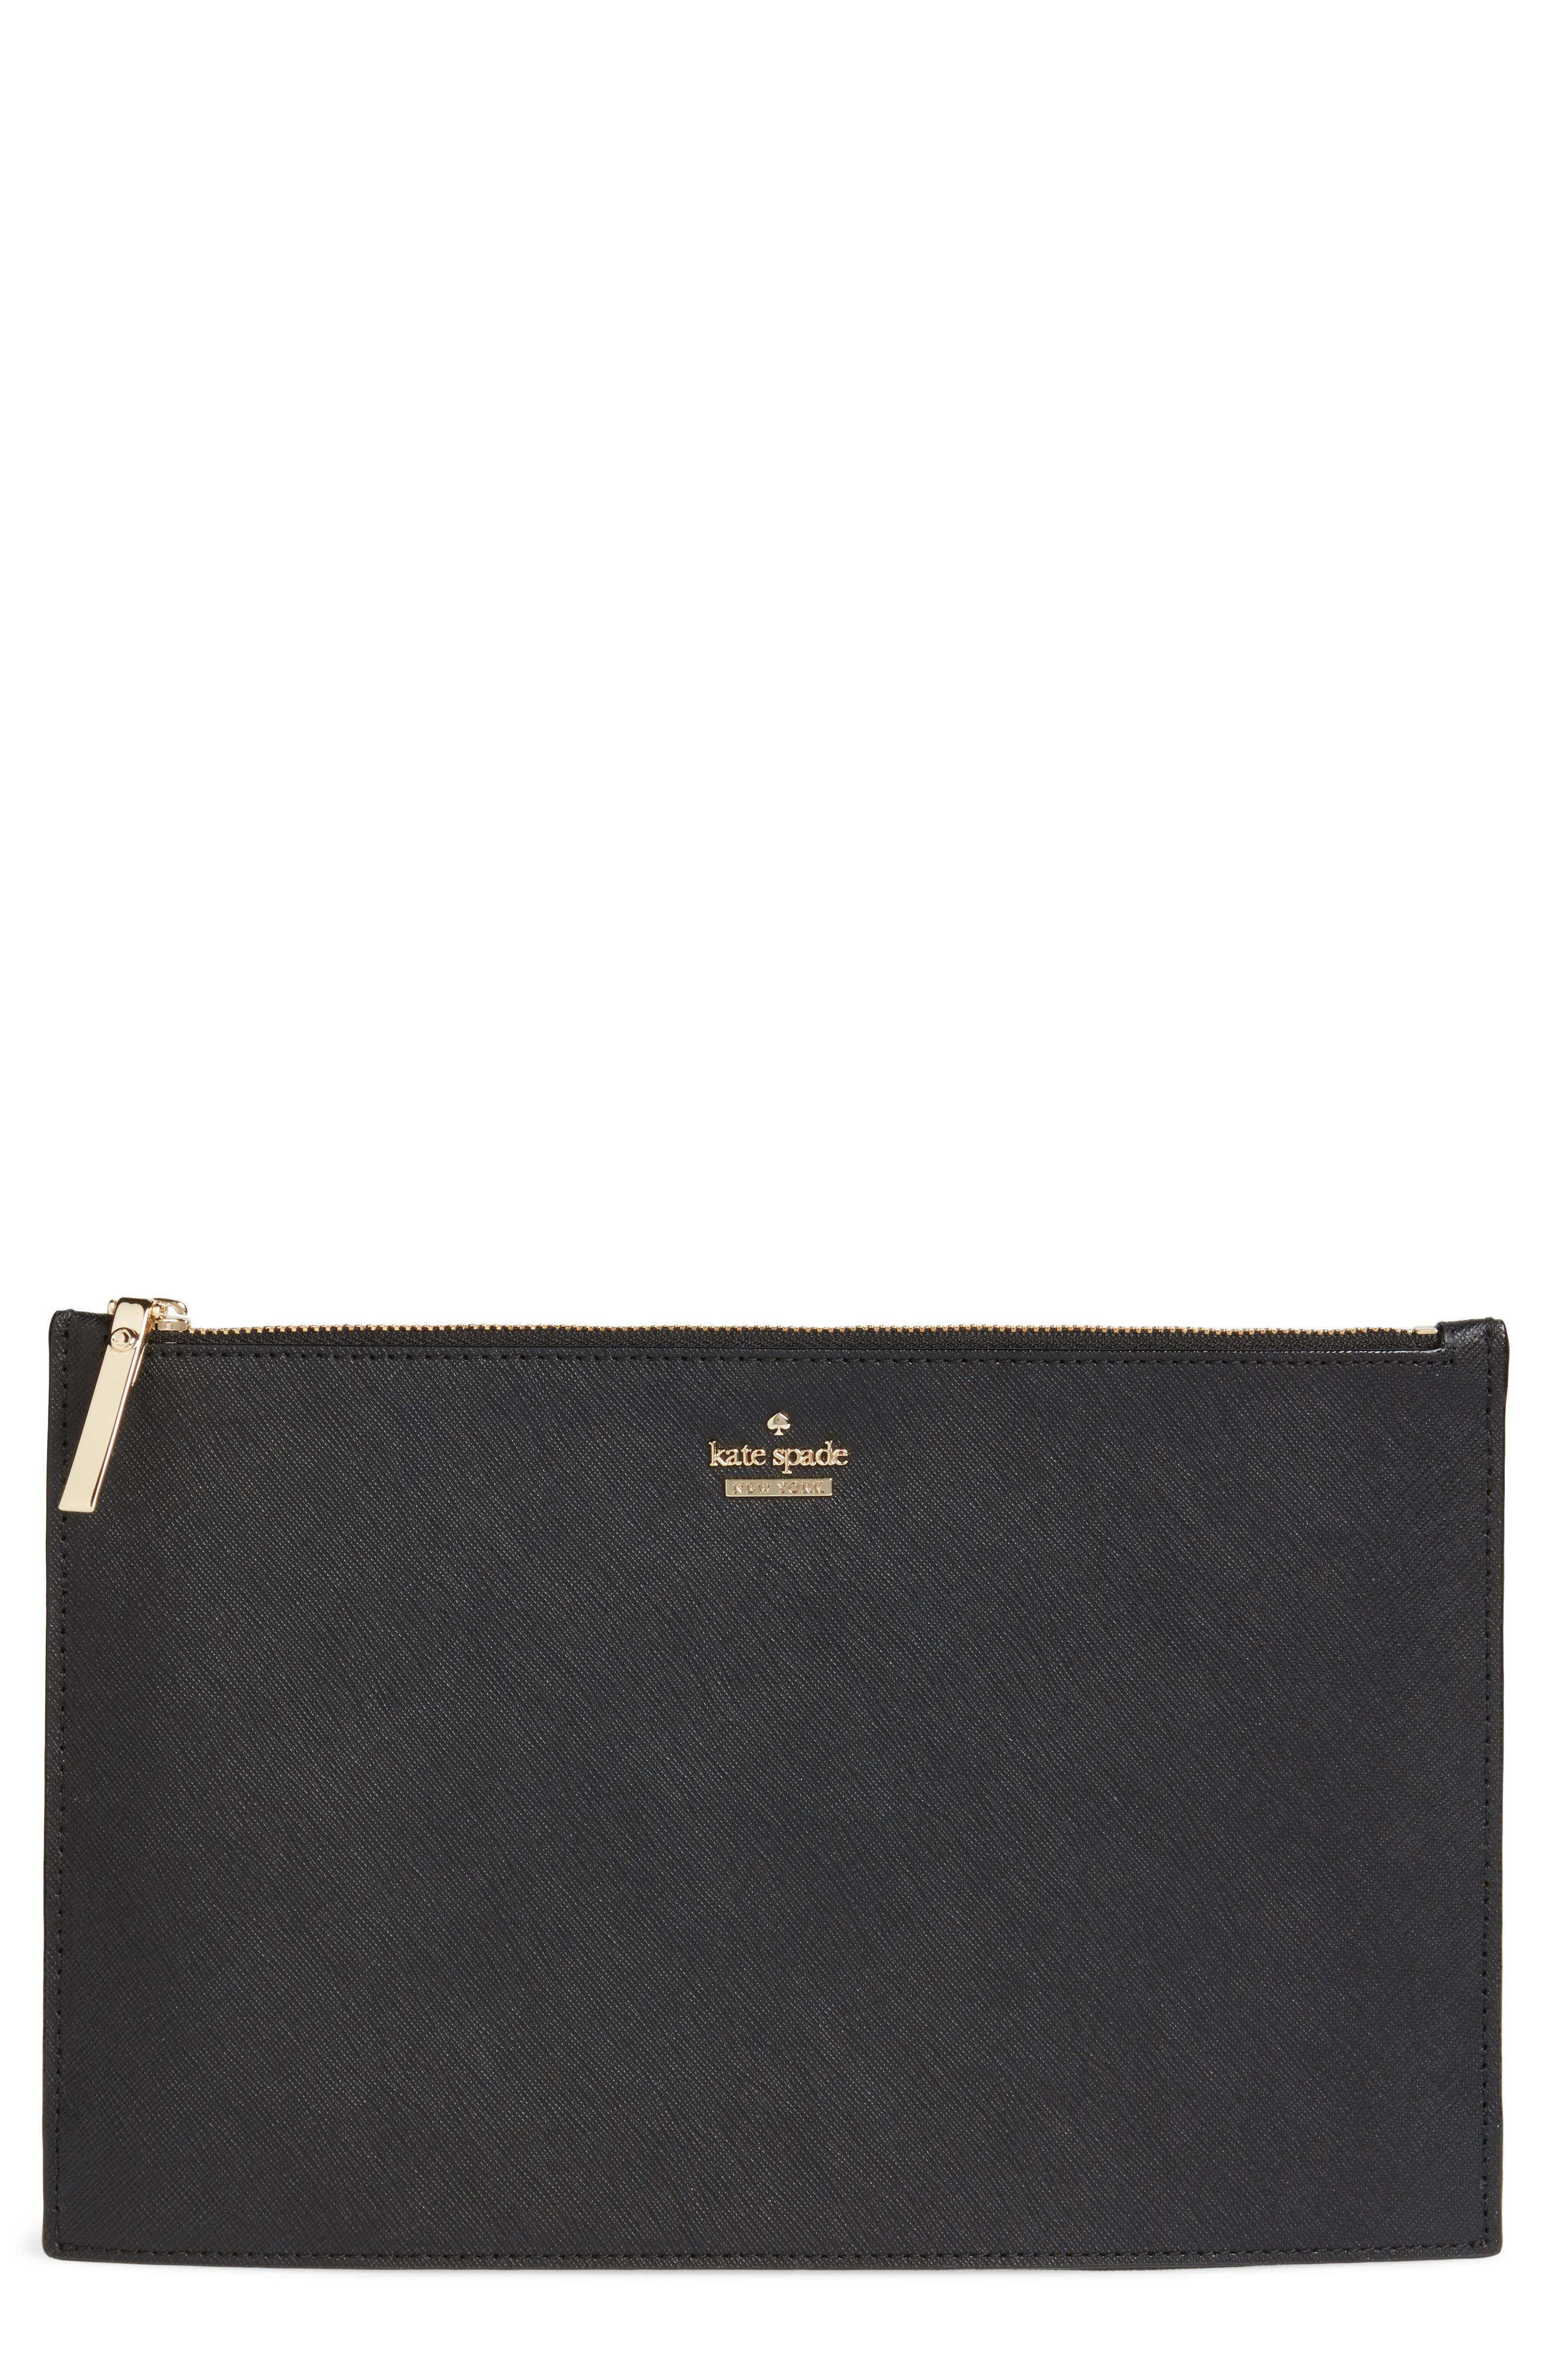 cameron street lilia leather clutch,                         Main,                         color, Black